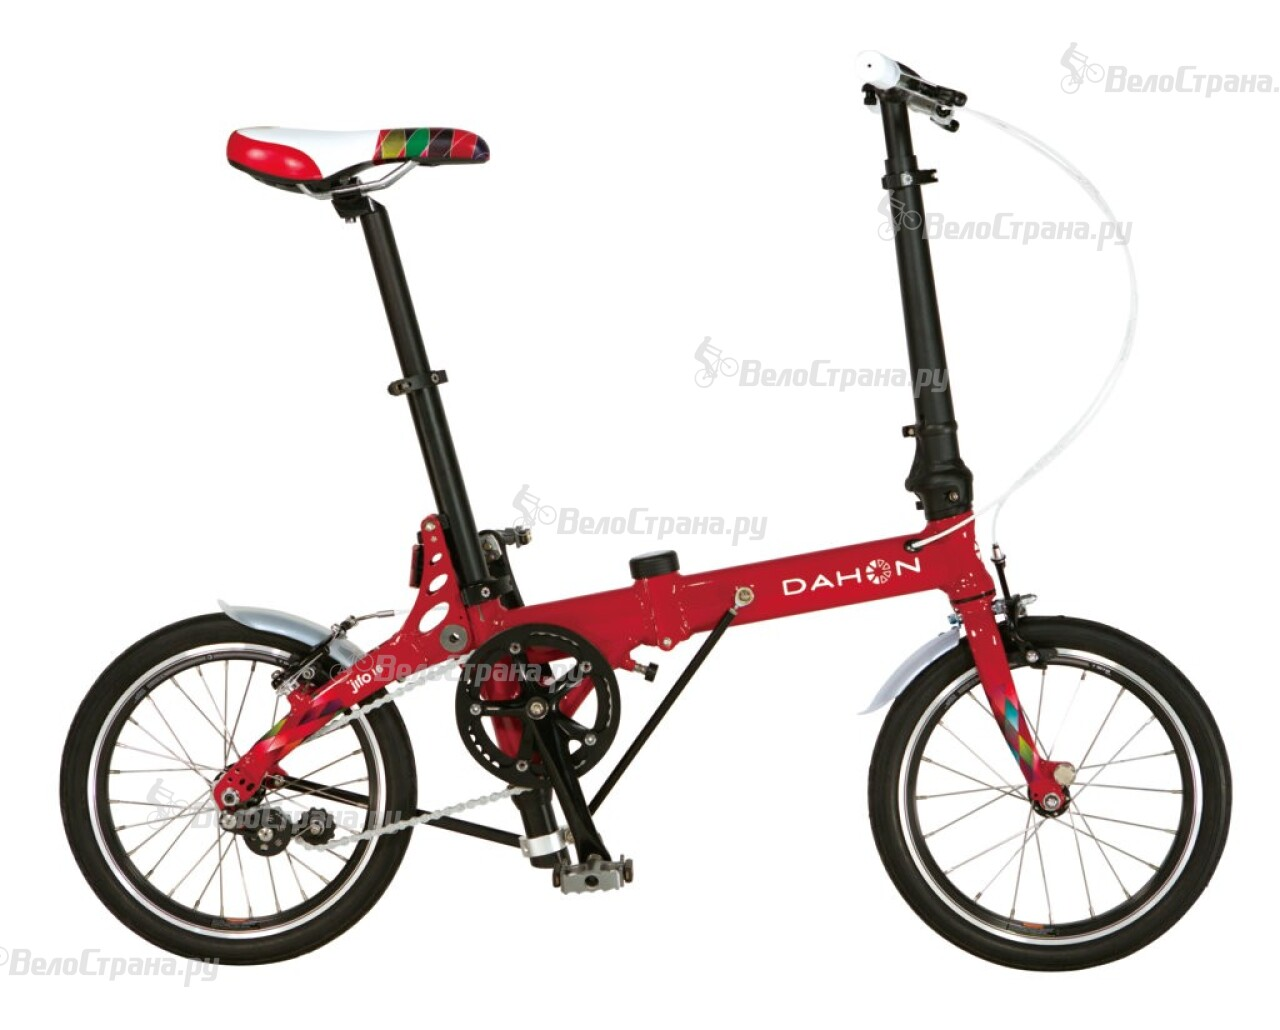 Велосипед Dahon Jifo (2014) велосипед dahon ciao d7 2015